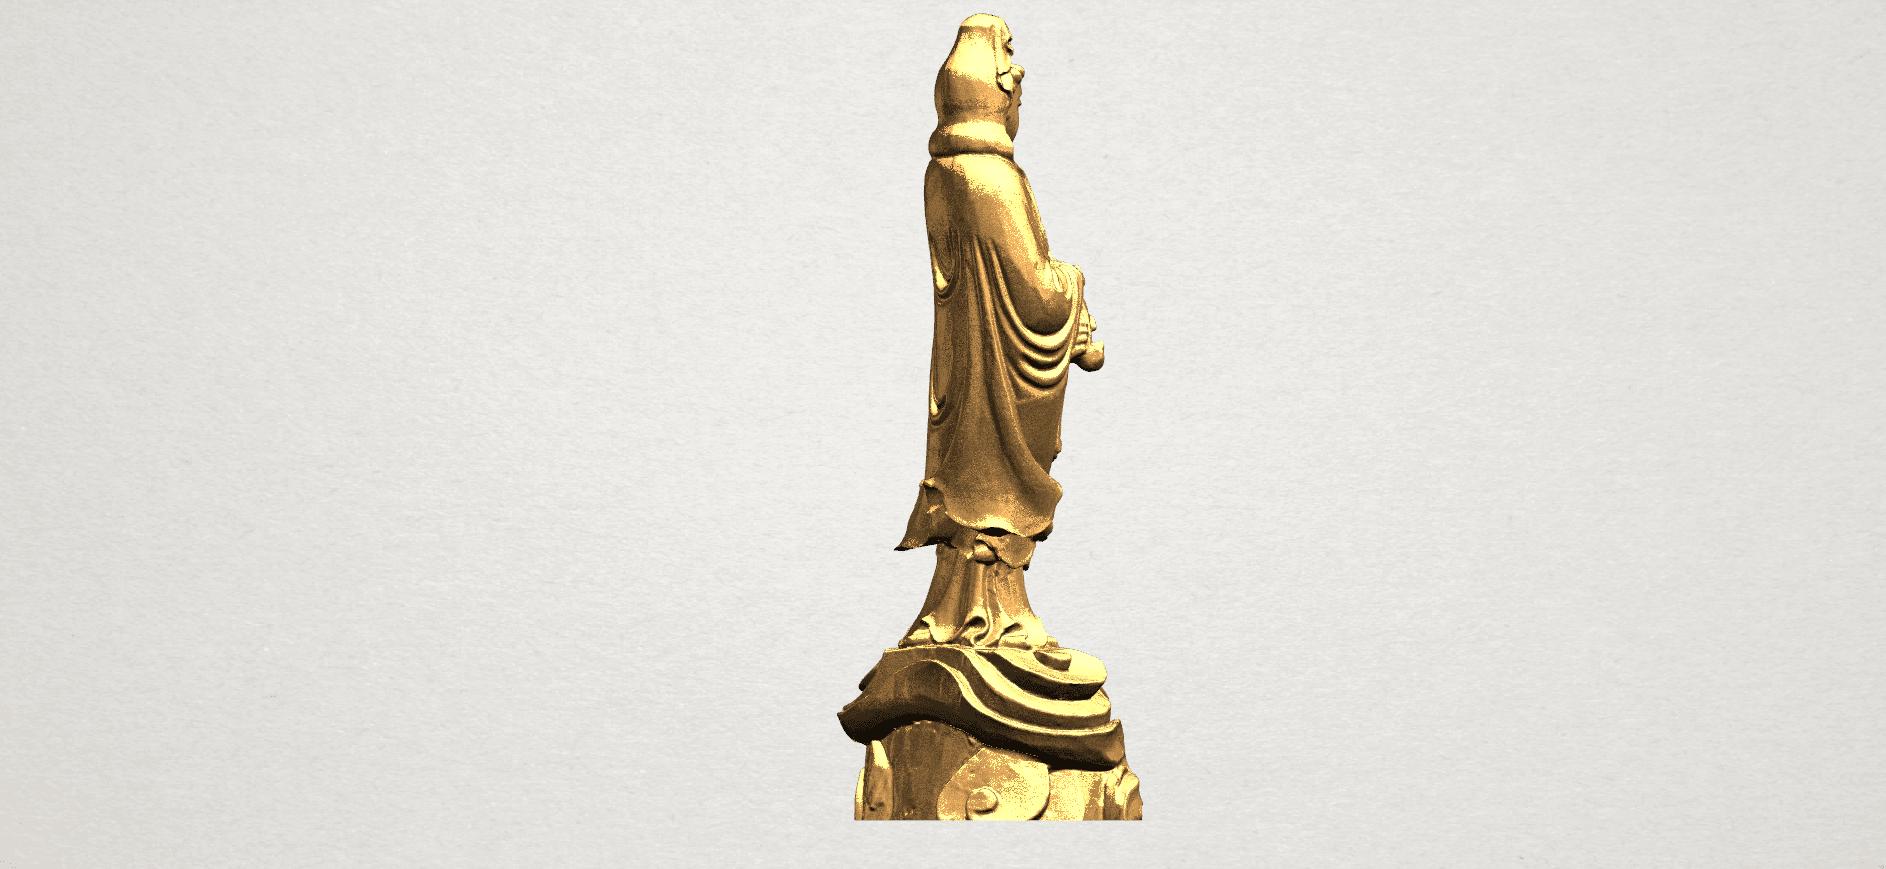 Avalokitesvara Buddha - Standing (iv) A06.png Download free STL file Avalokitesvara Buddha - Standing 04 • 3D print template, GeorgesNikkei